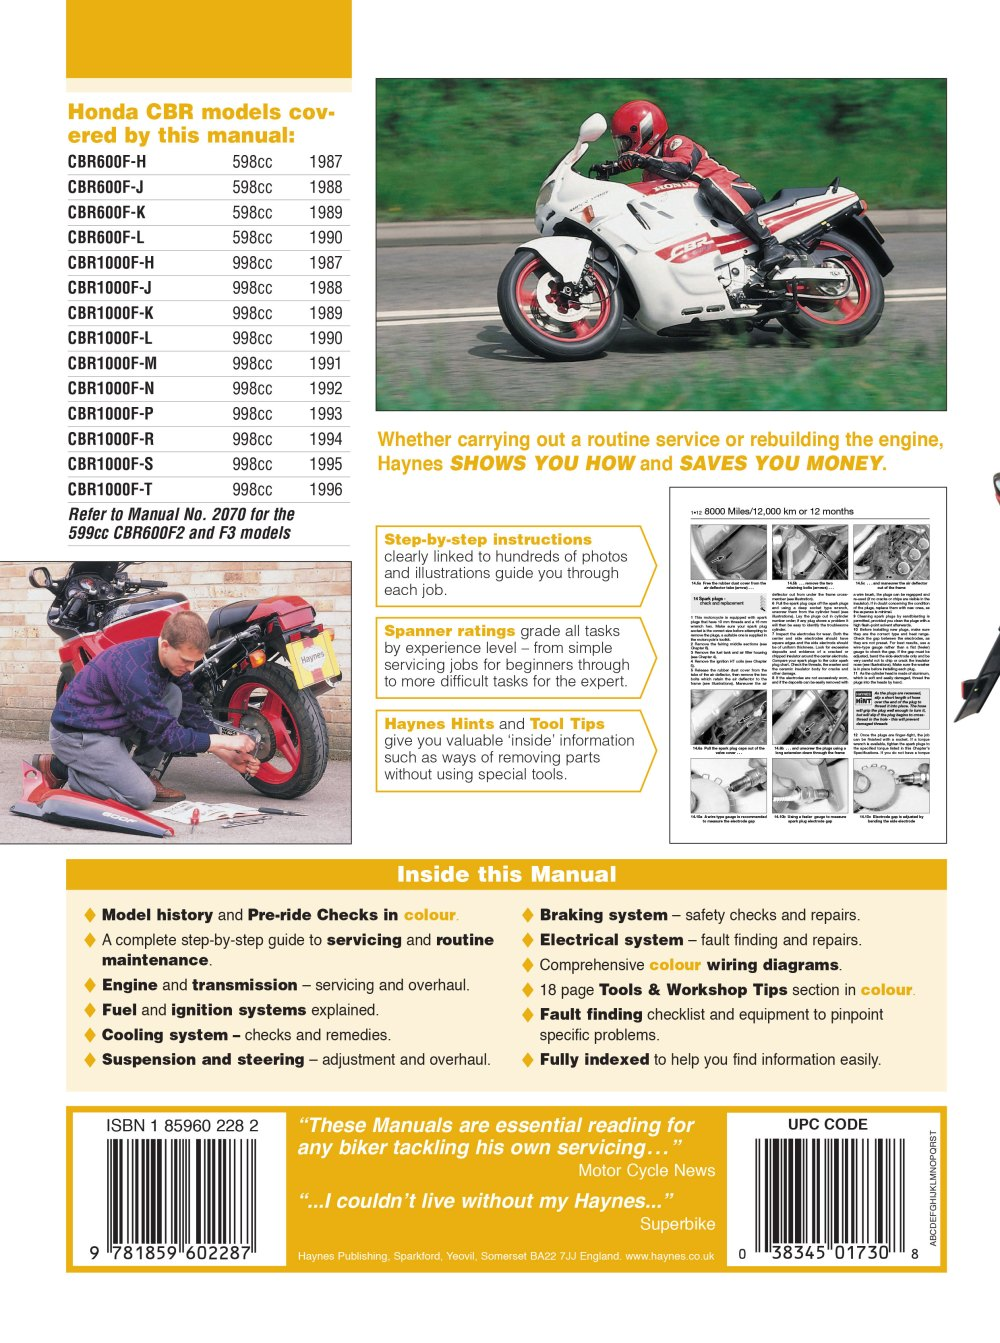 medium resolution of haynes repair manual honda cbr600 f1 cbr1000 f 598cc 998cc 1987 1996 honda cbr600f1 87 96 electrical wiring diagram